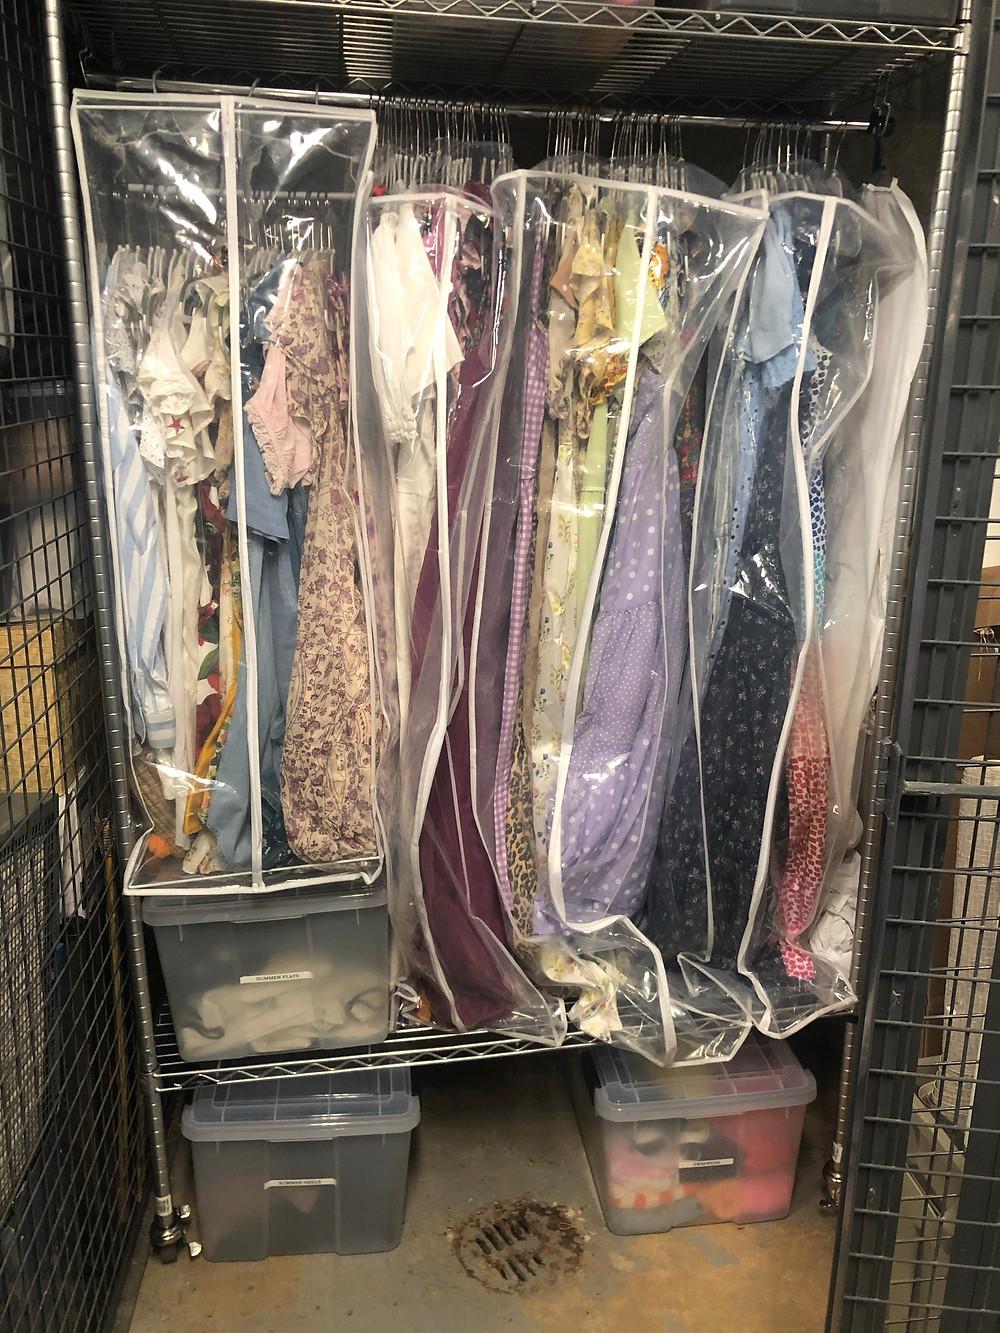 a garment rack in a storage unit